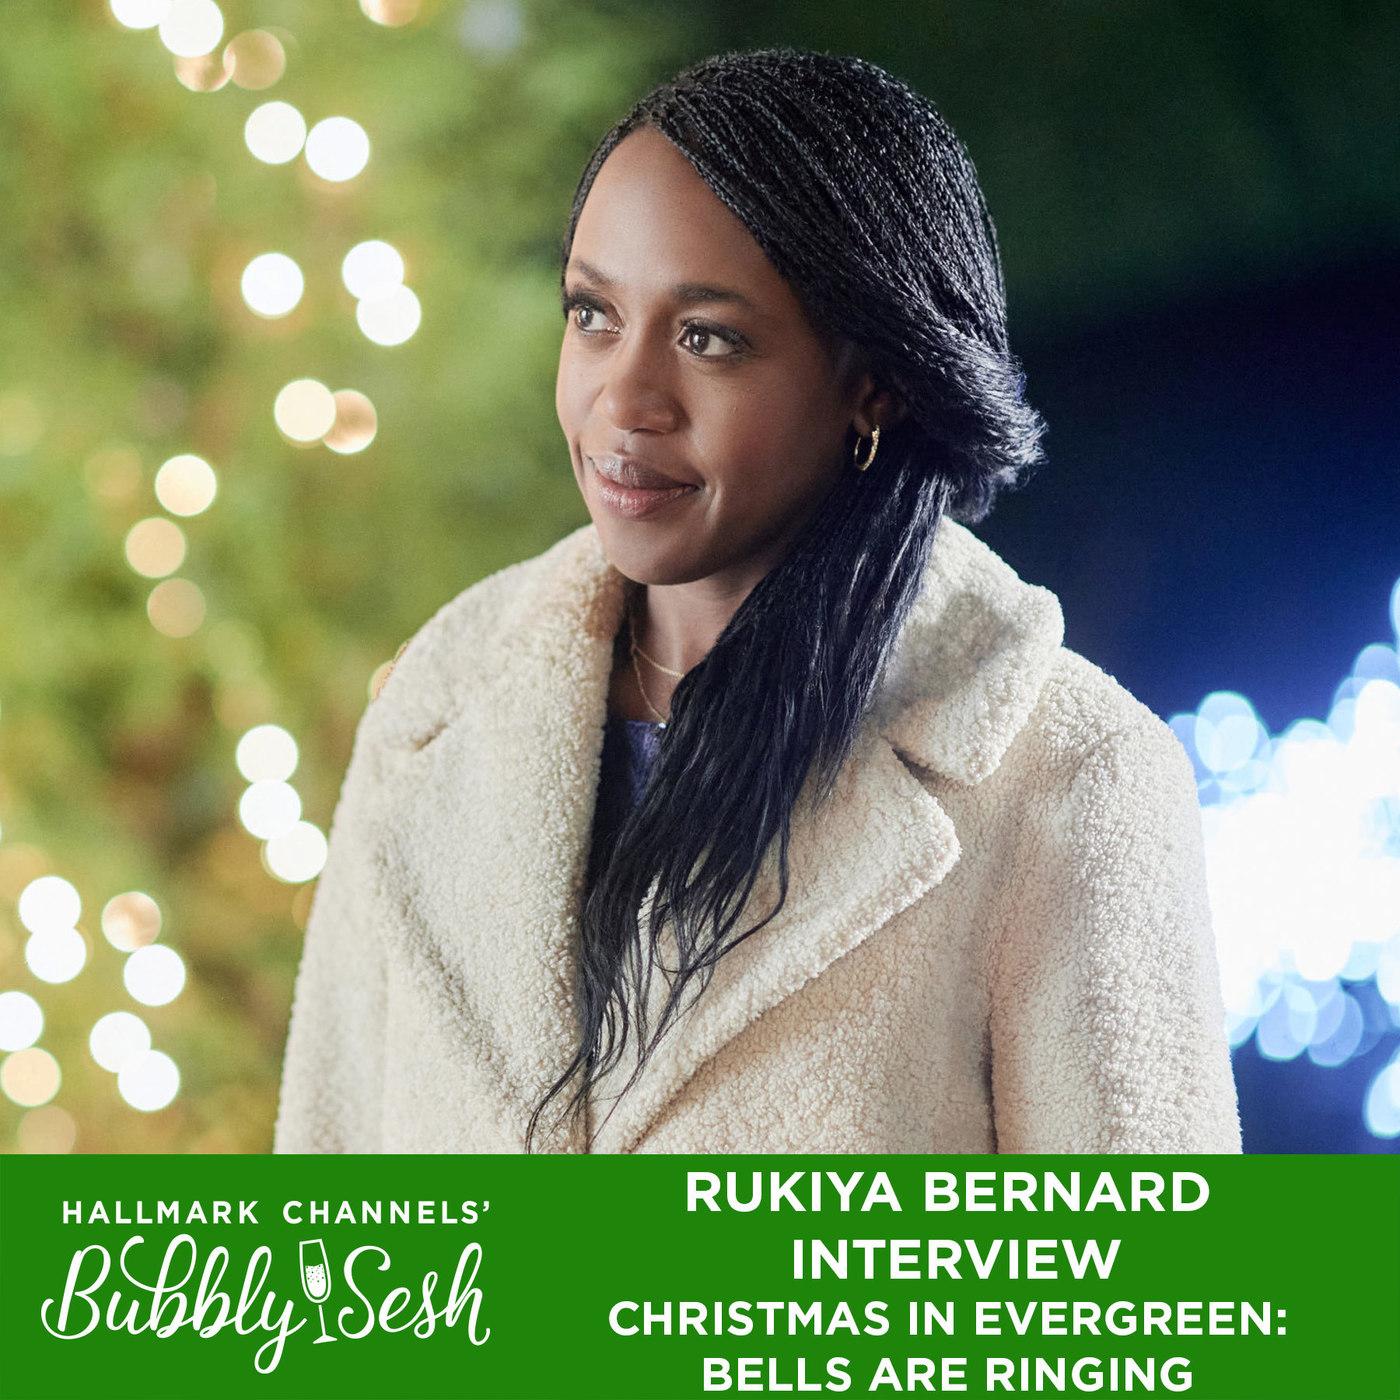 Rukiya Bernard Interview